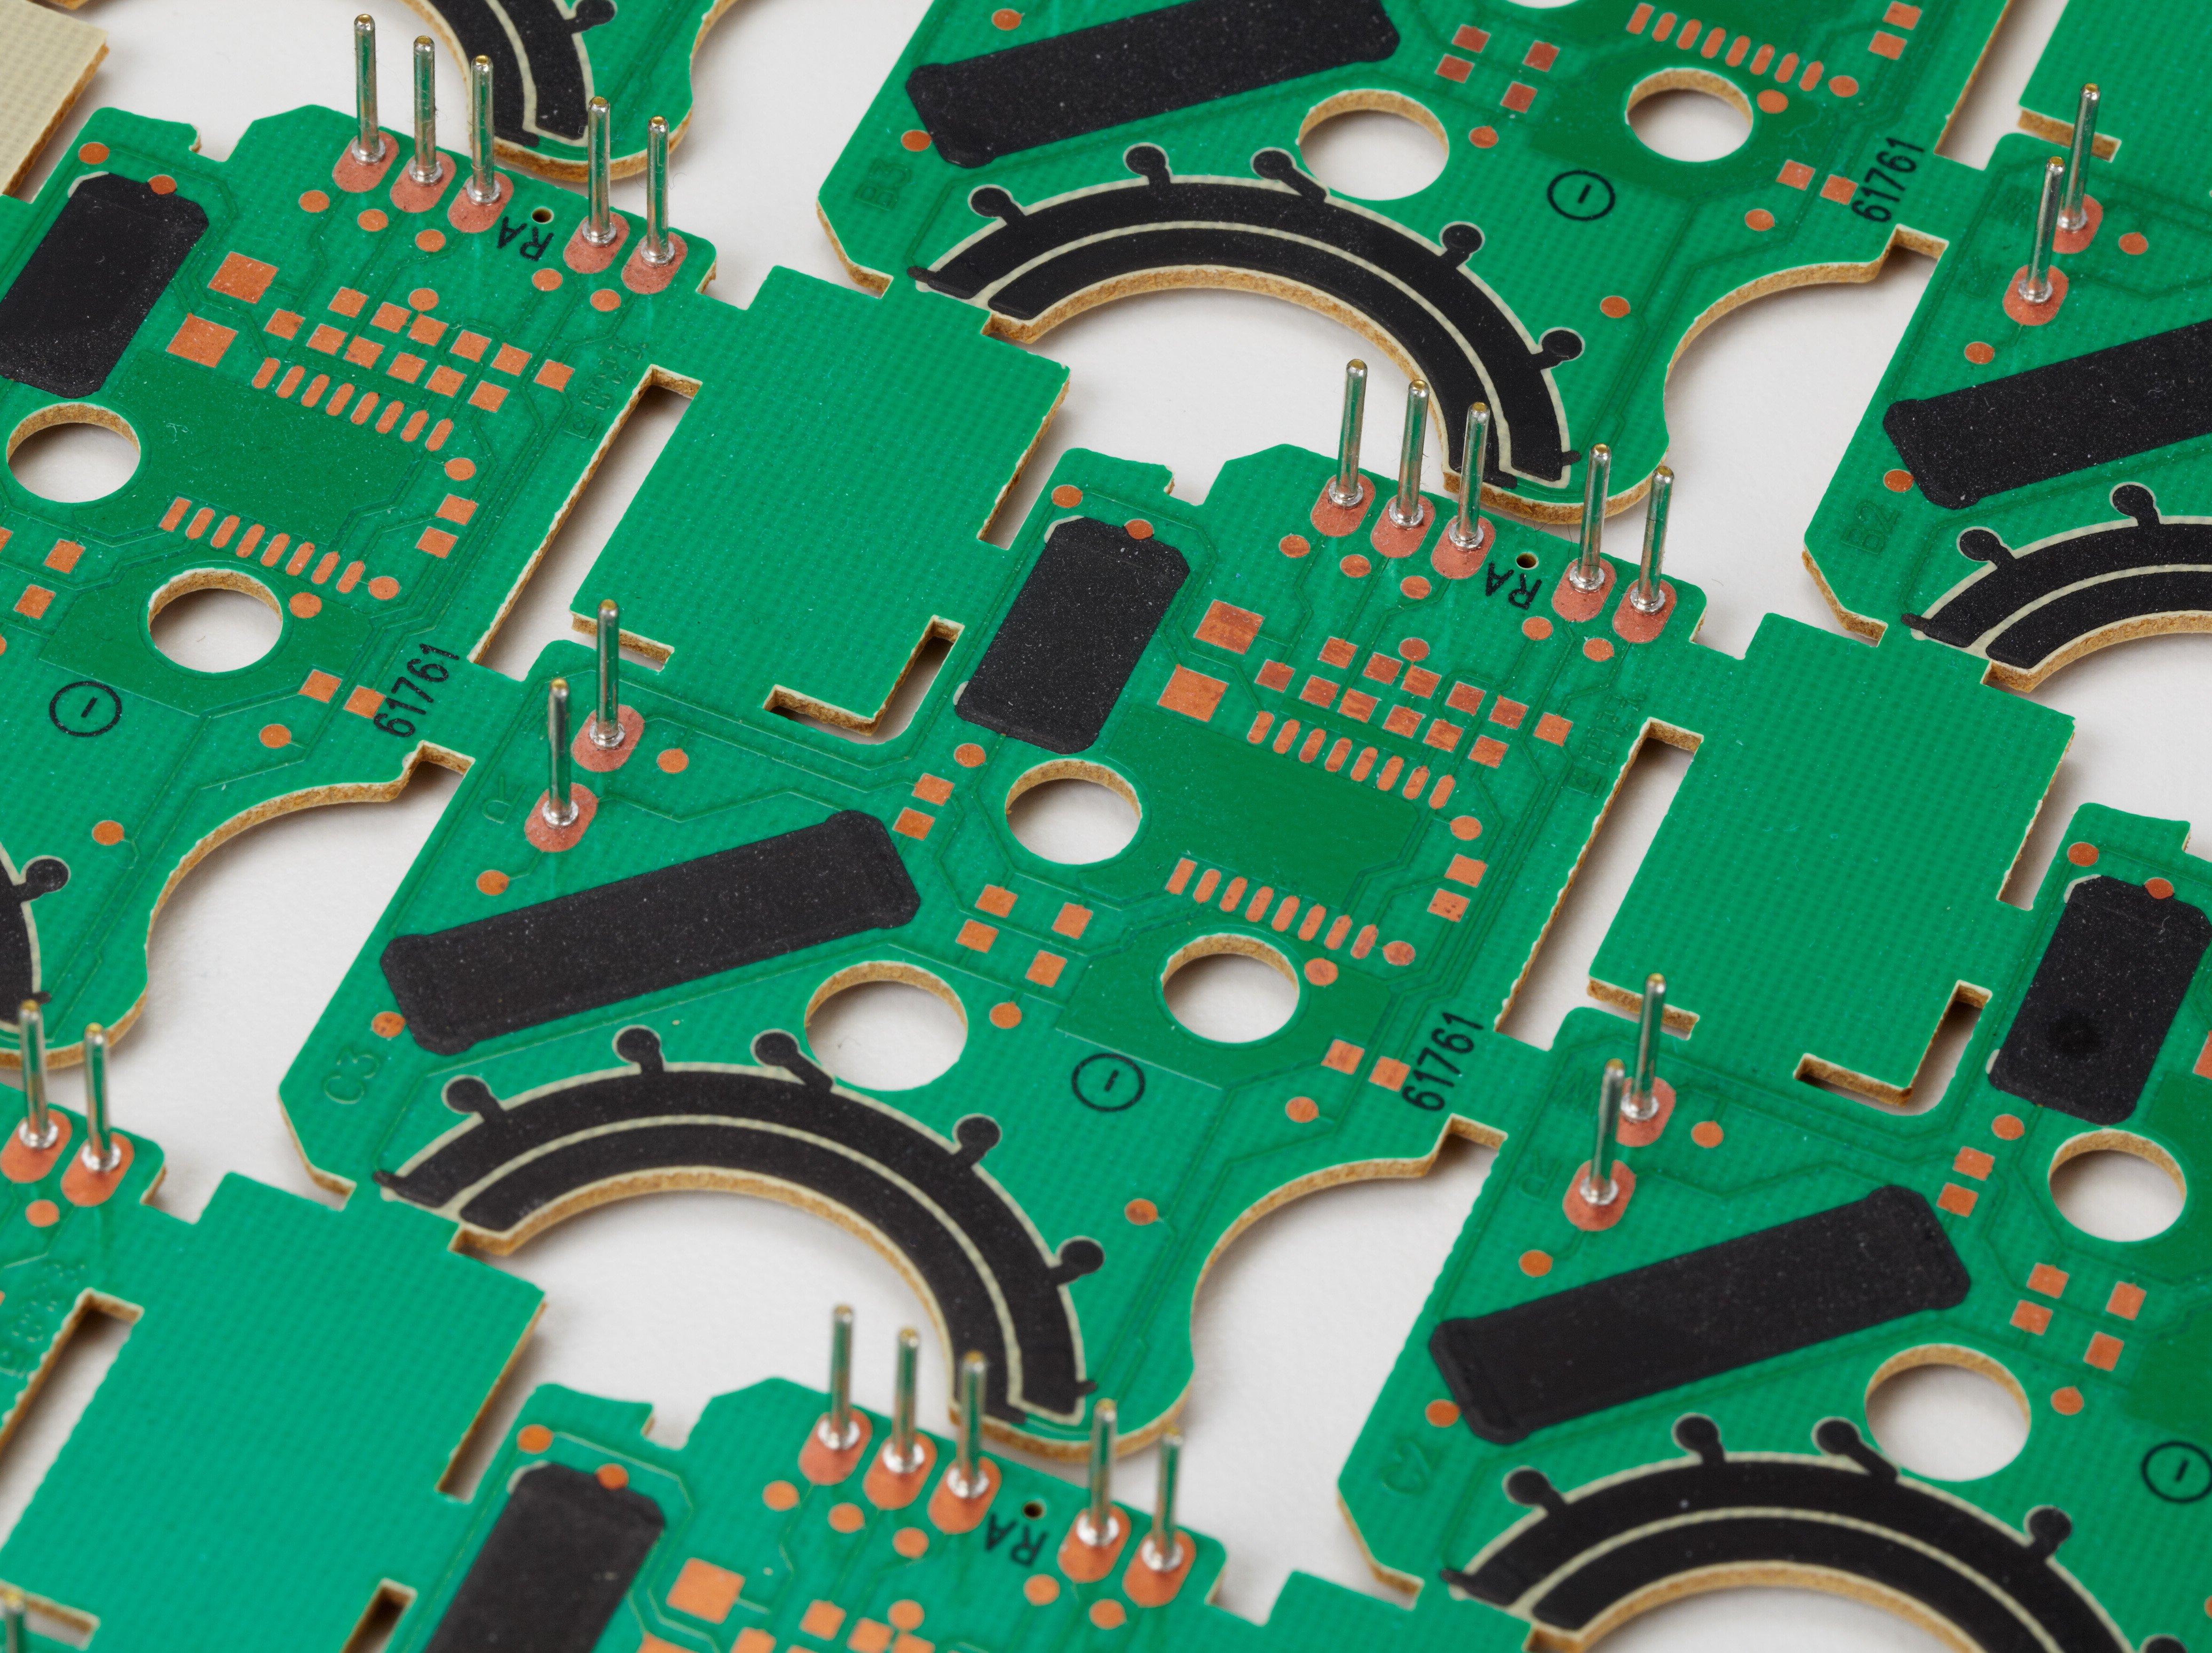 CircuitPanel13022